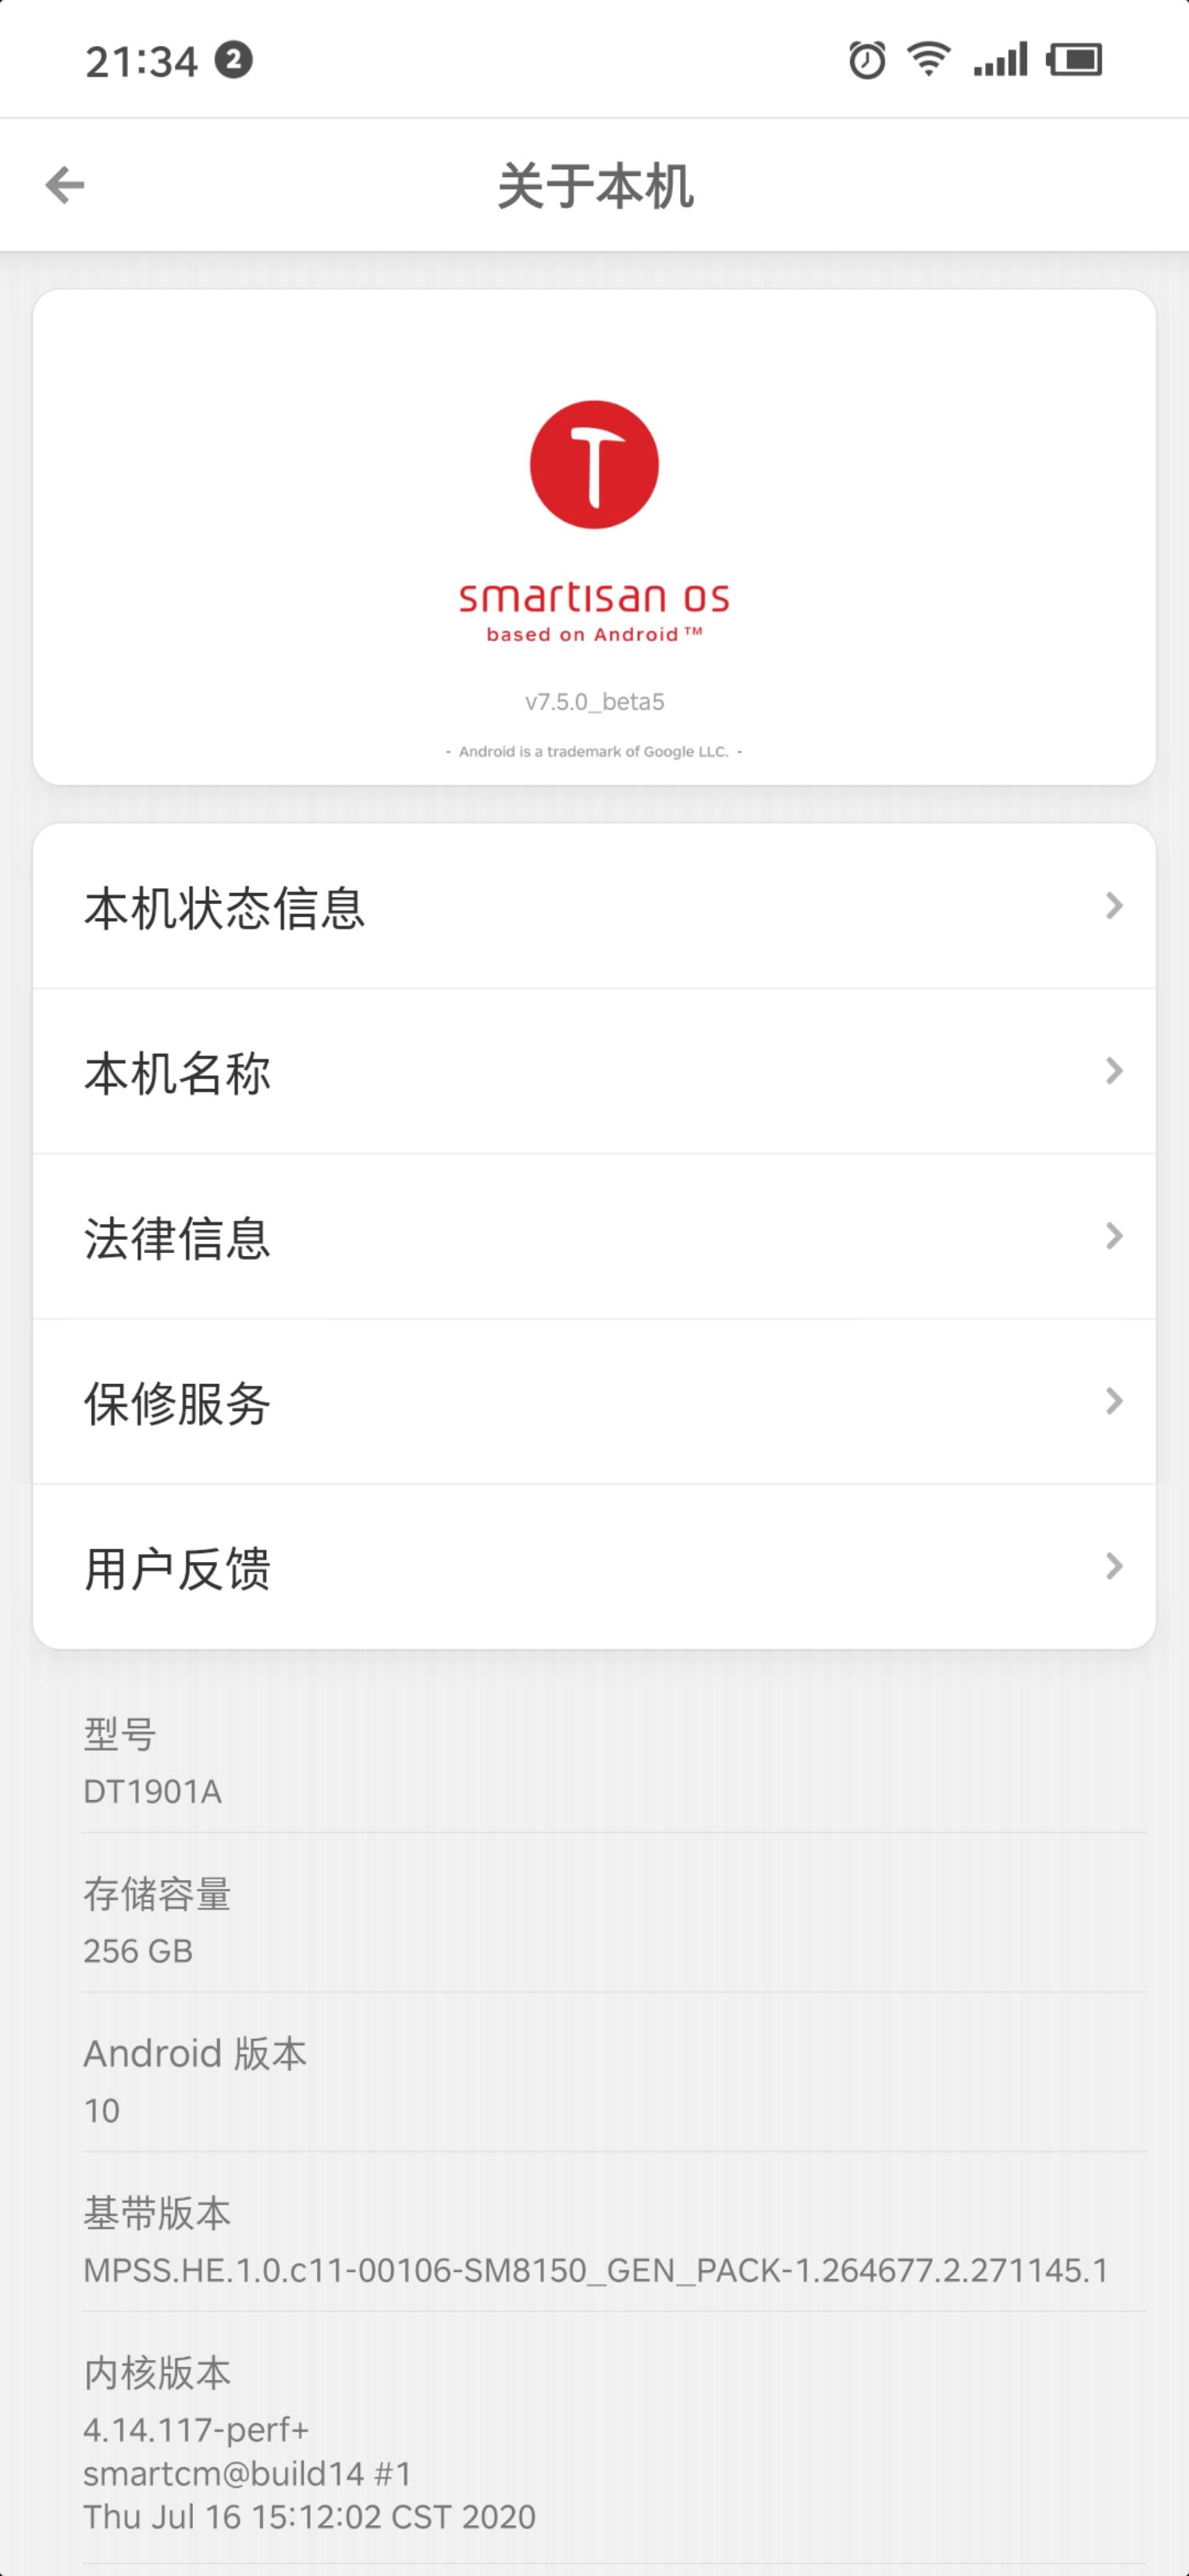 Screenshot_2020-08-03-21-34-54-082_??.png